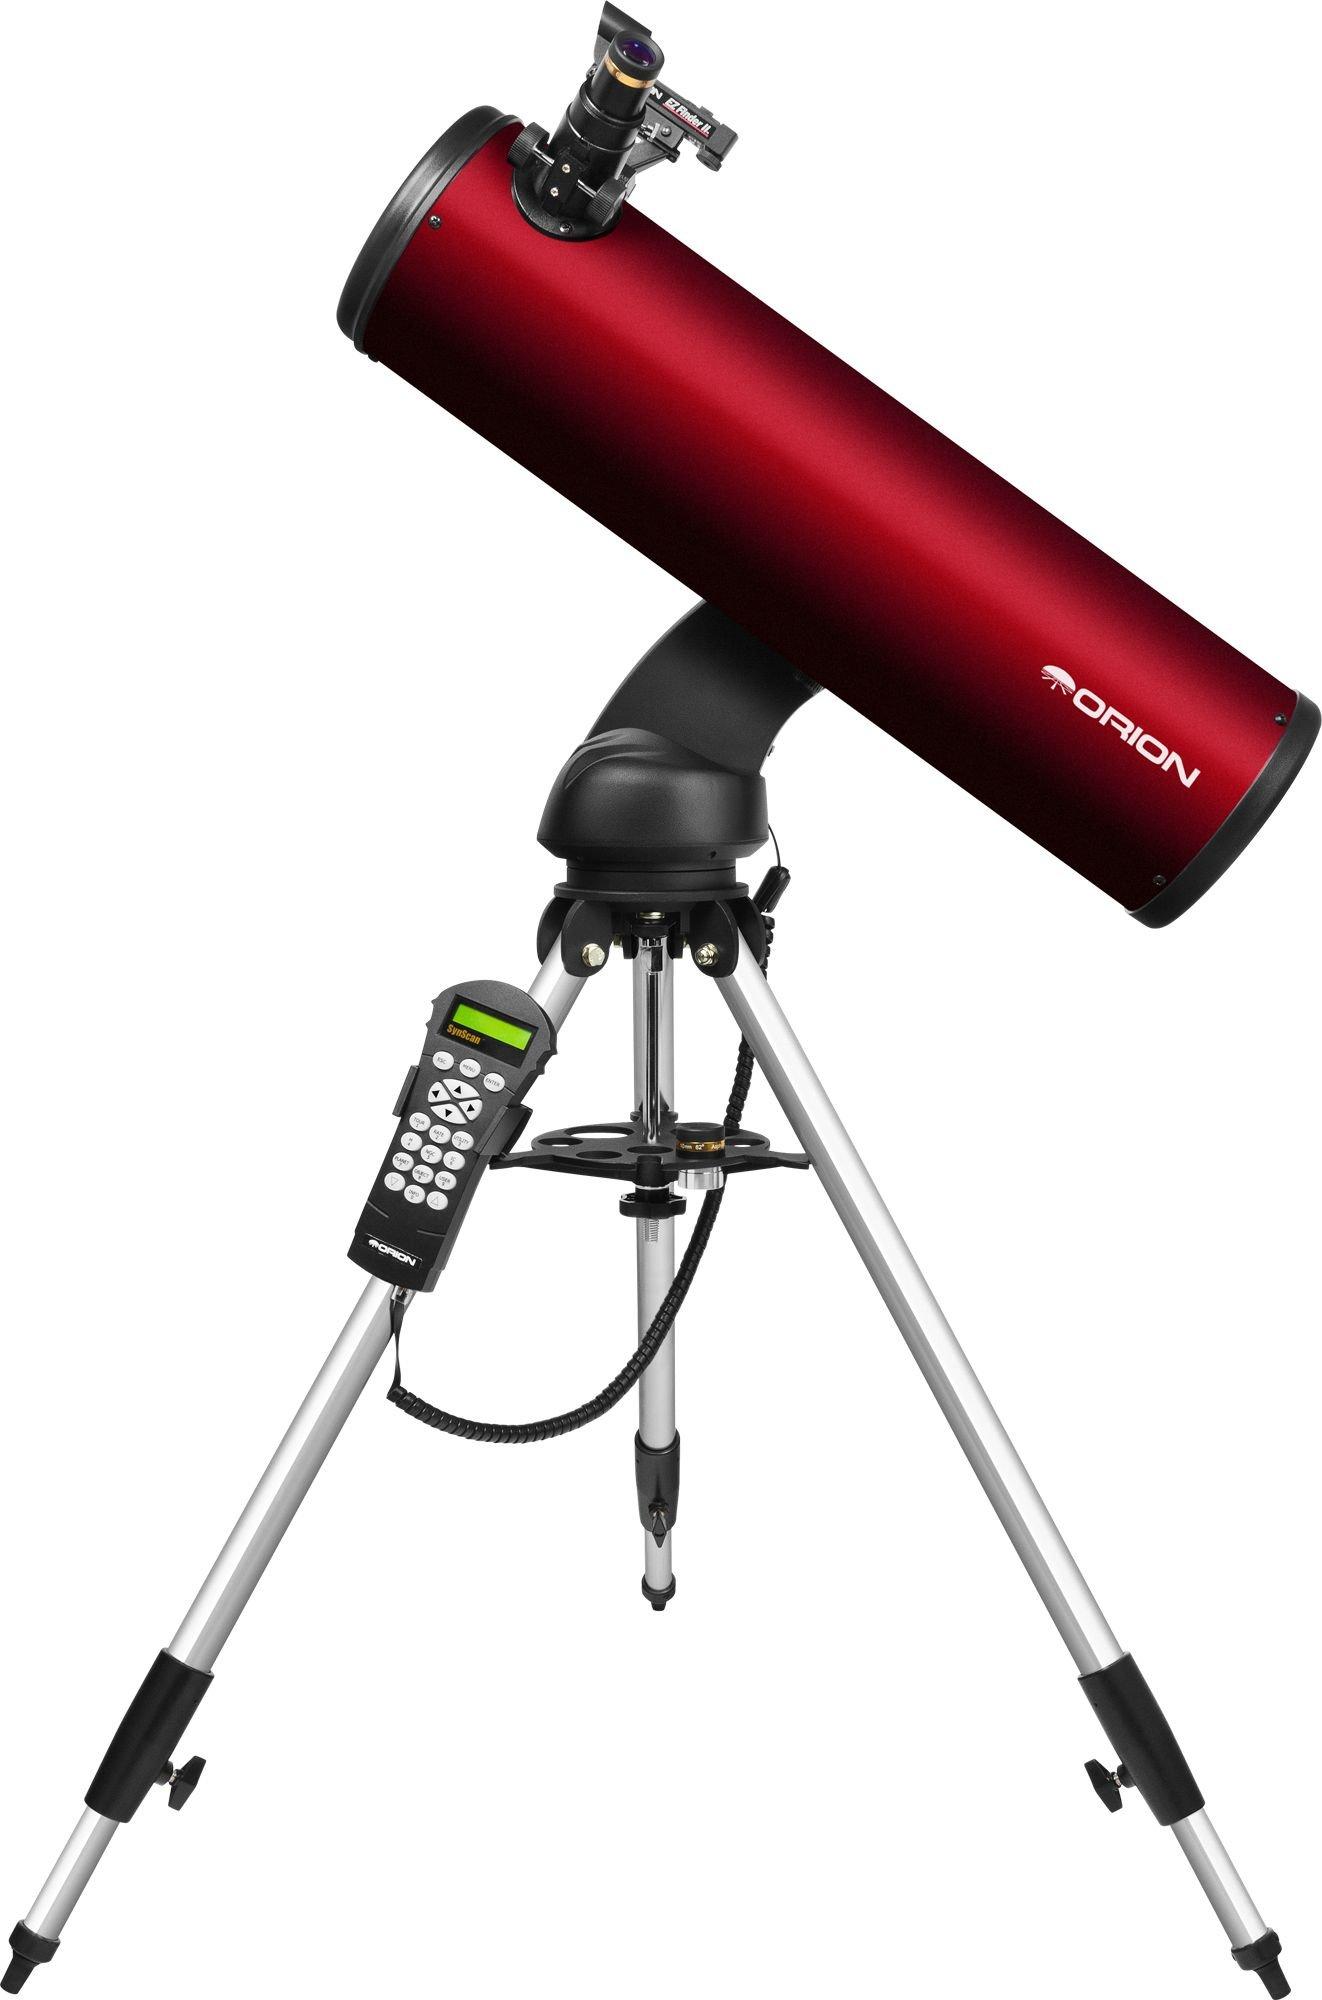 Orion StarSeeker IV 150mm GoTo Reflector Kit